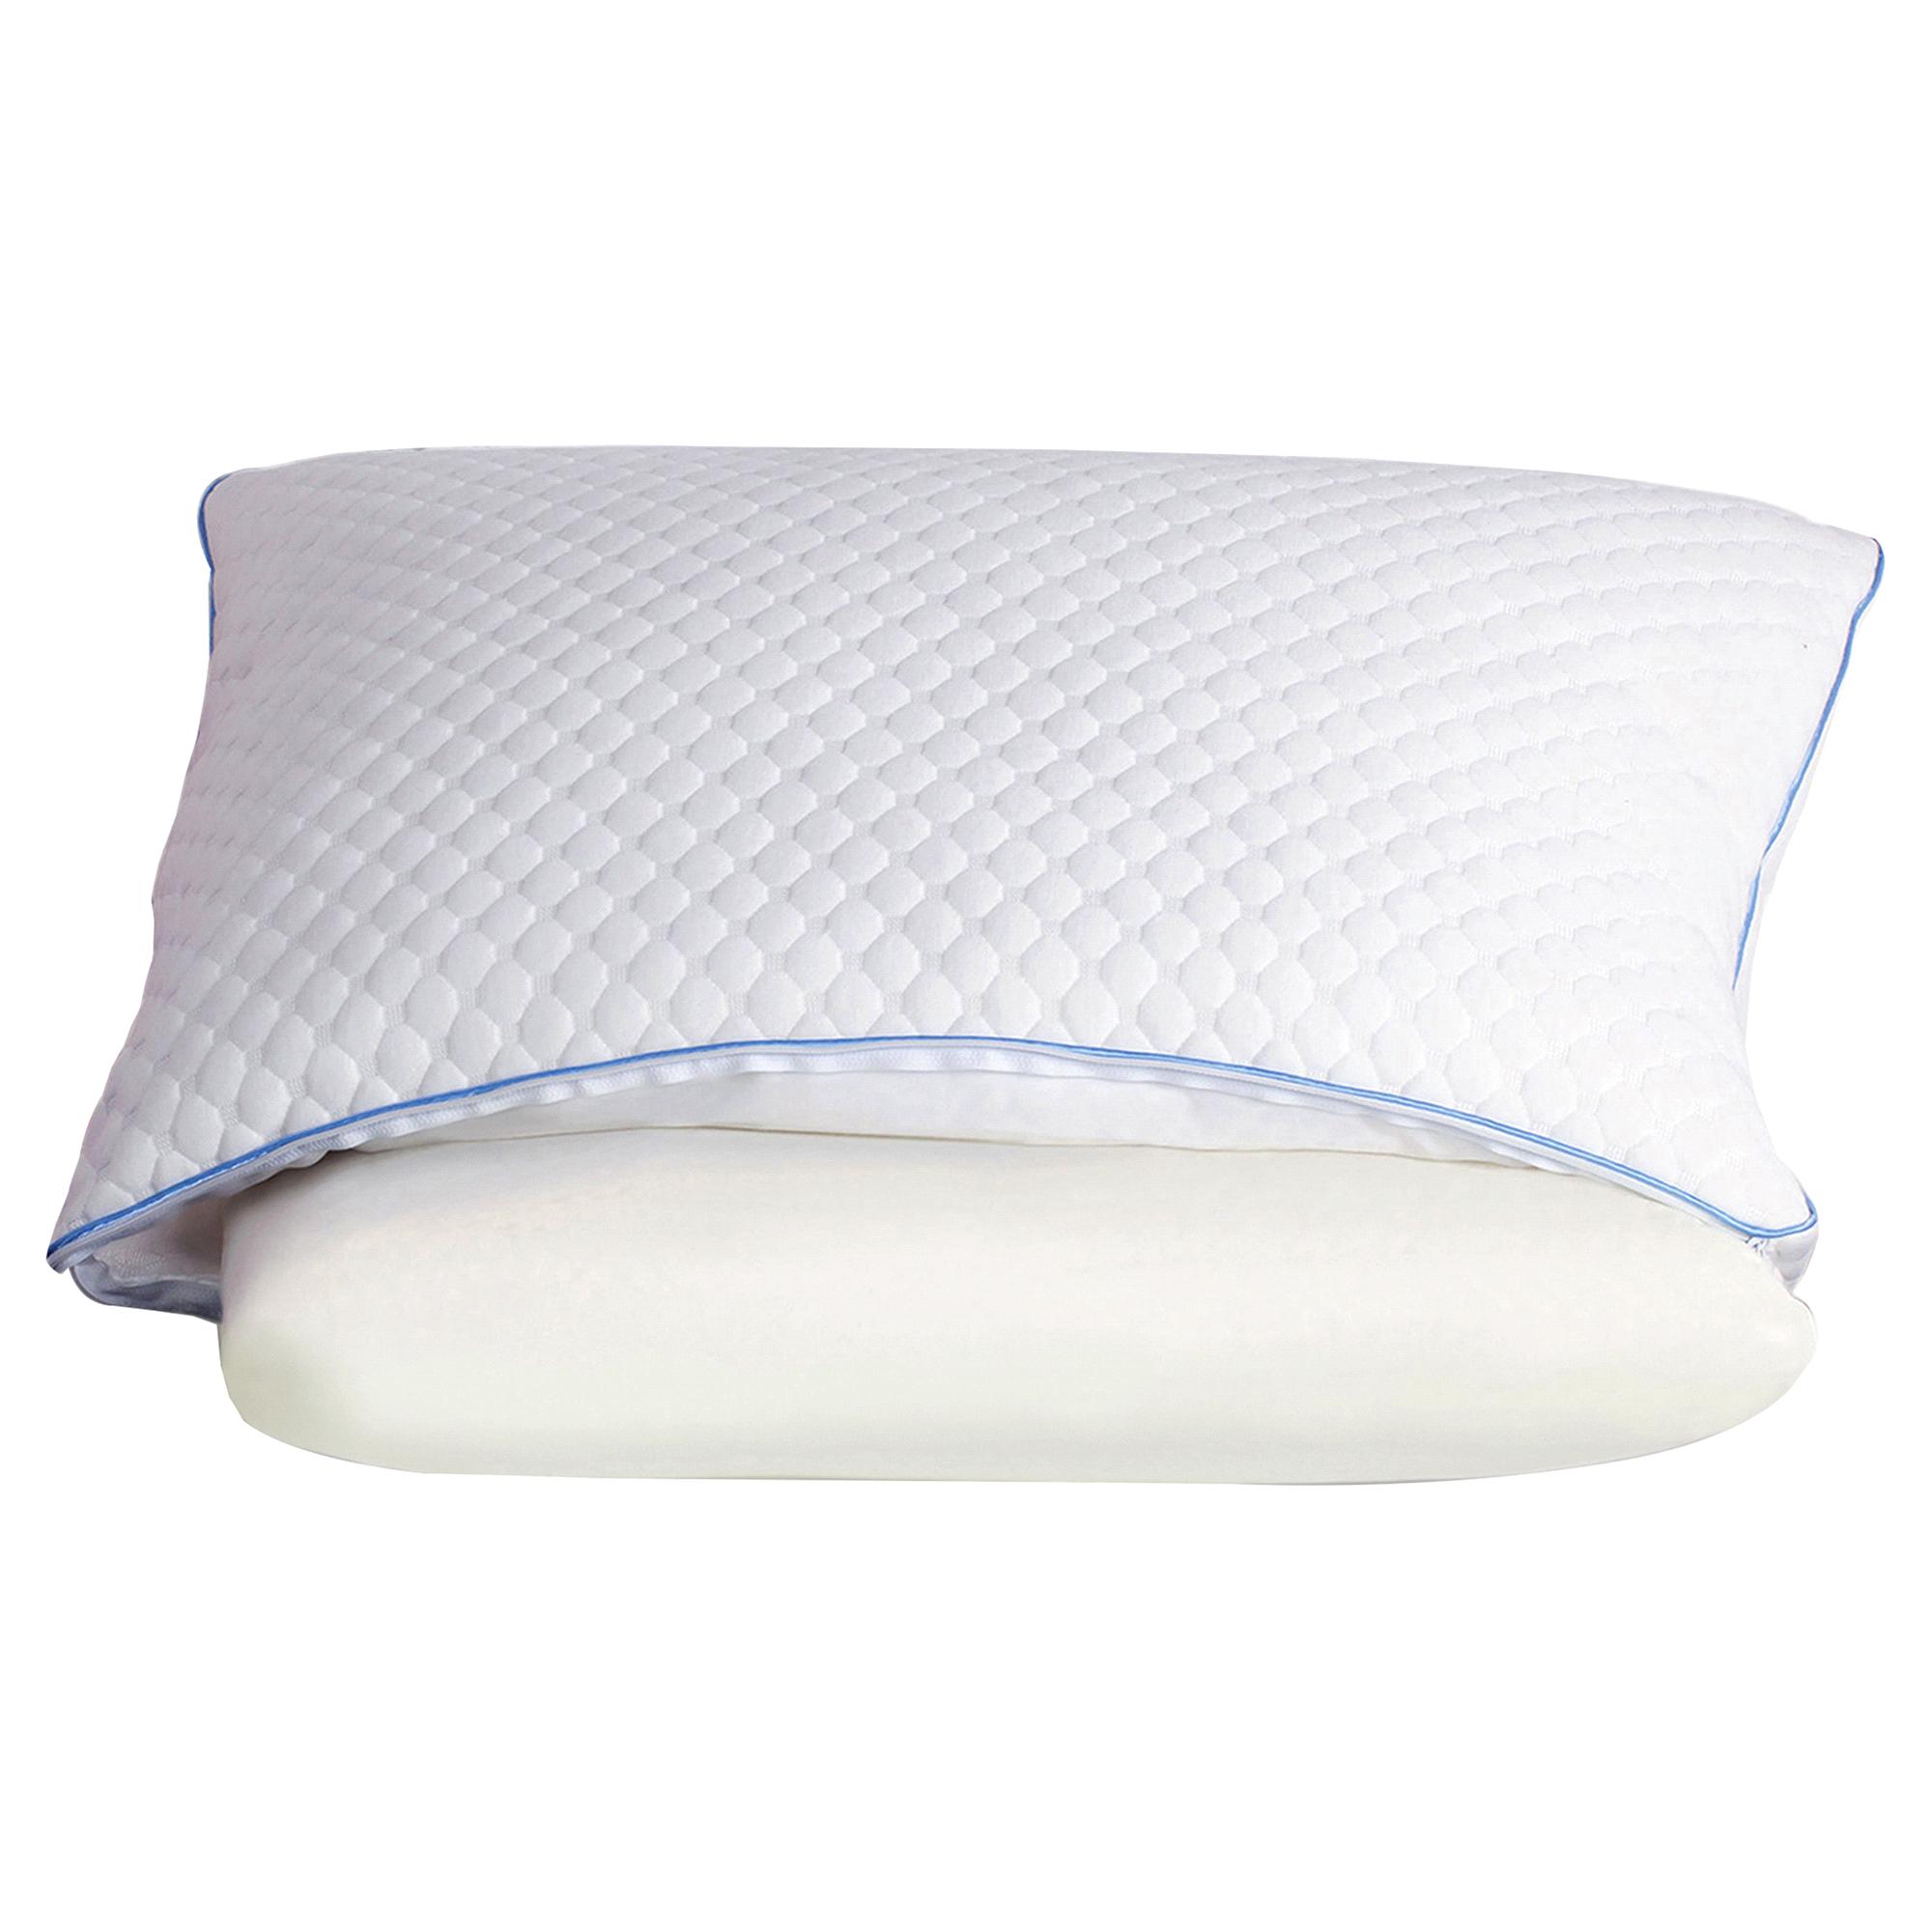 Bed rest pillow black - Bed Rest Pillow Black 28